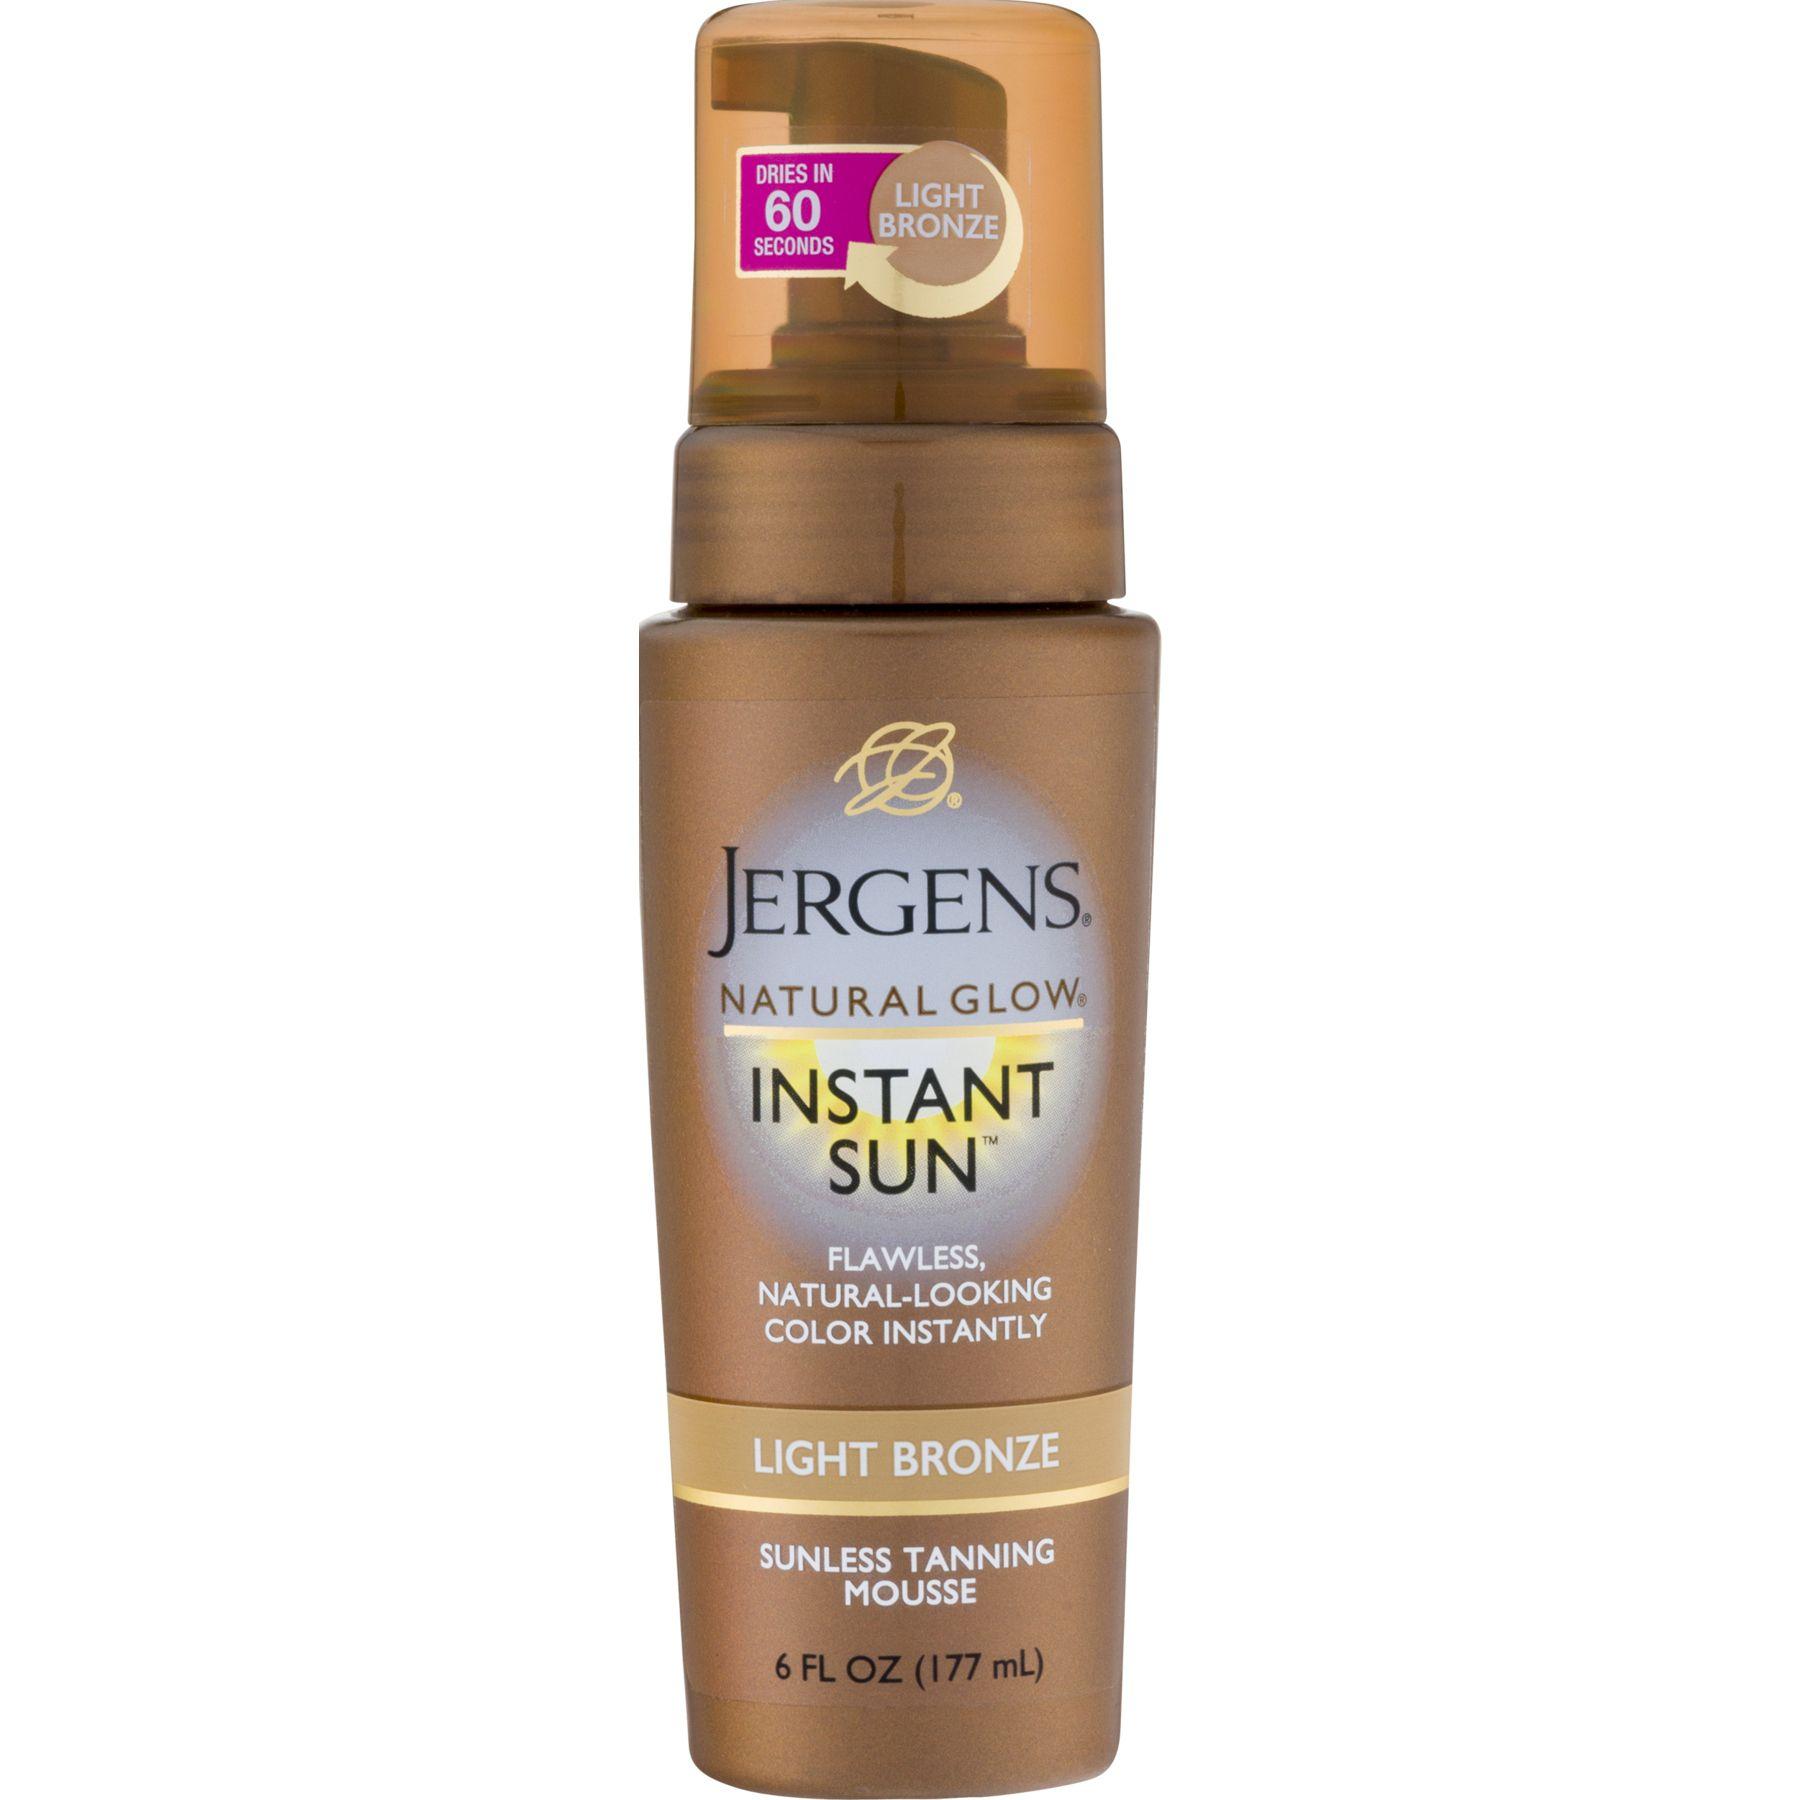 Jergens Natural Glow Instant Sun Light Bronze Sunless Tanning Mousse